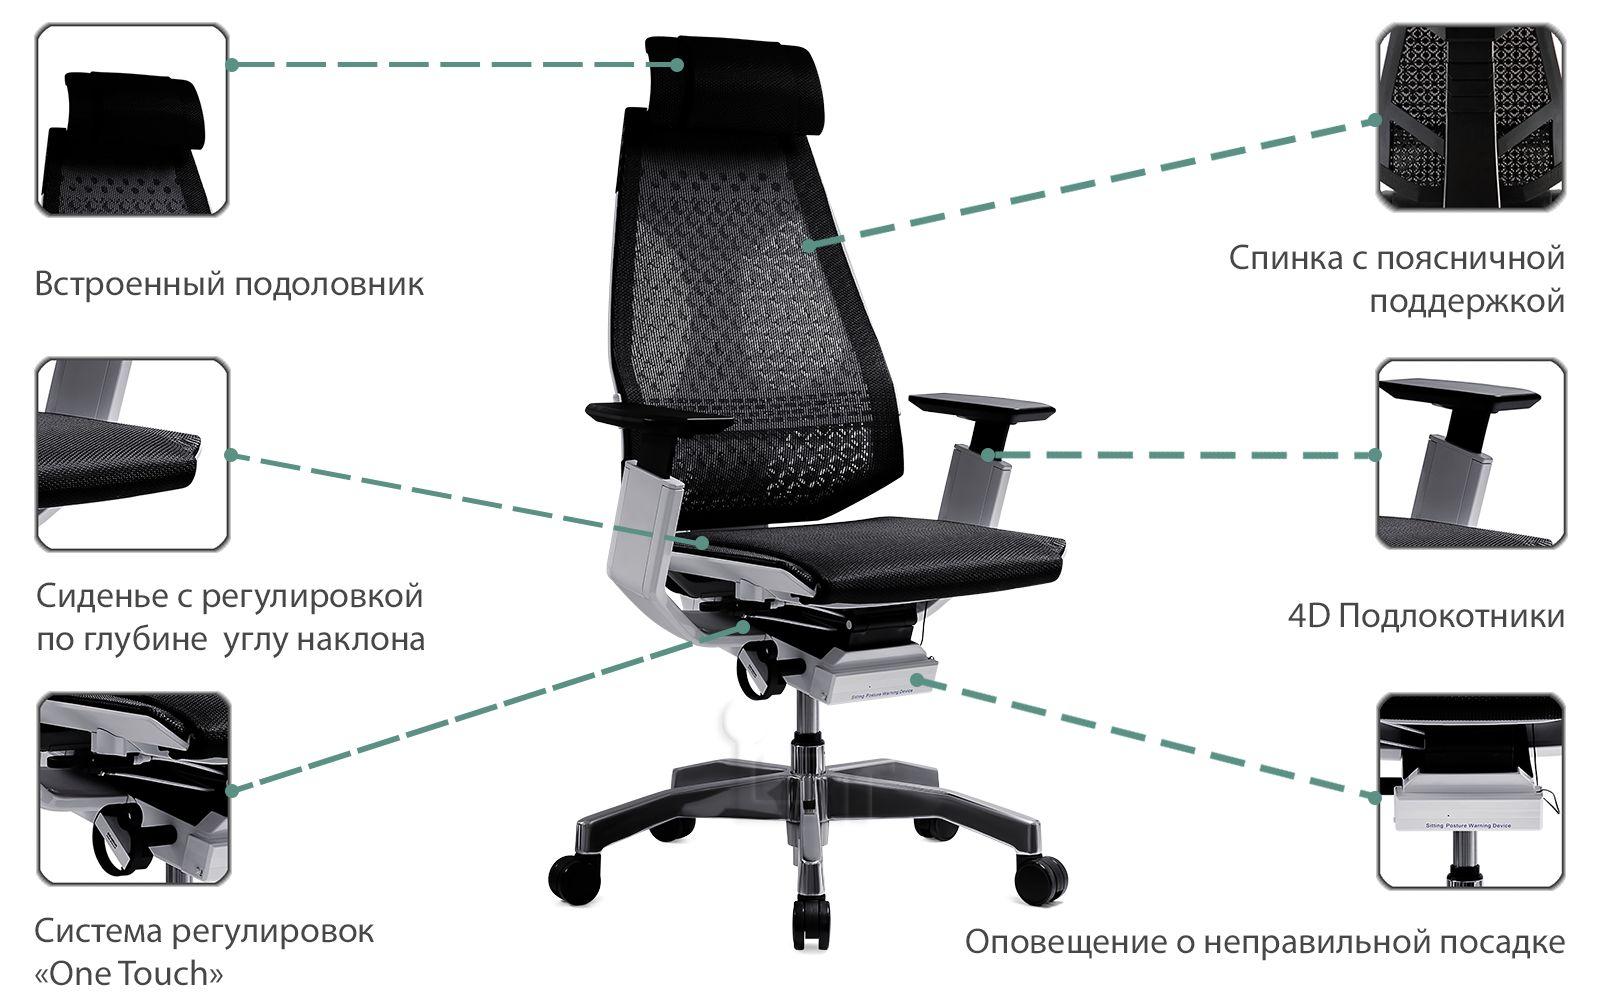 Инфографика кресло Geniaia от Comfort Seating (Workspace)